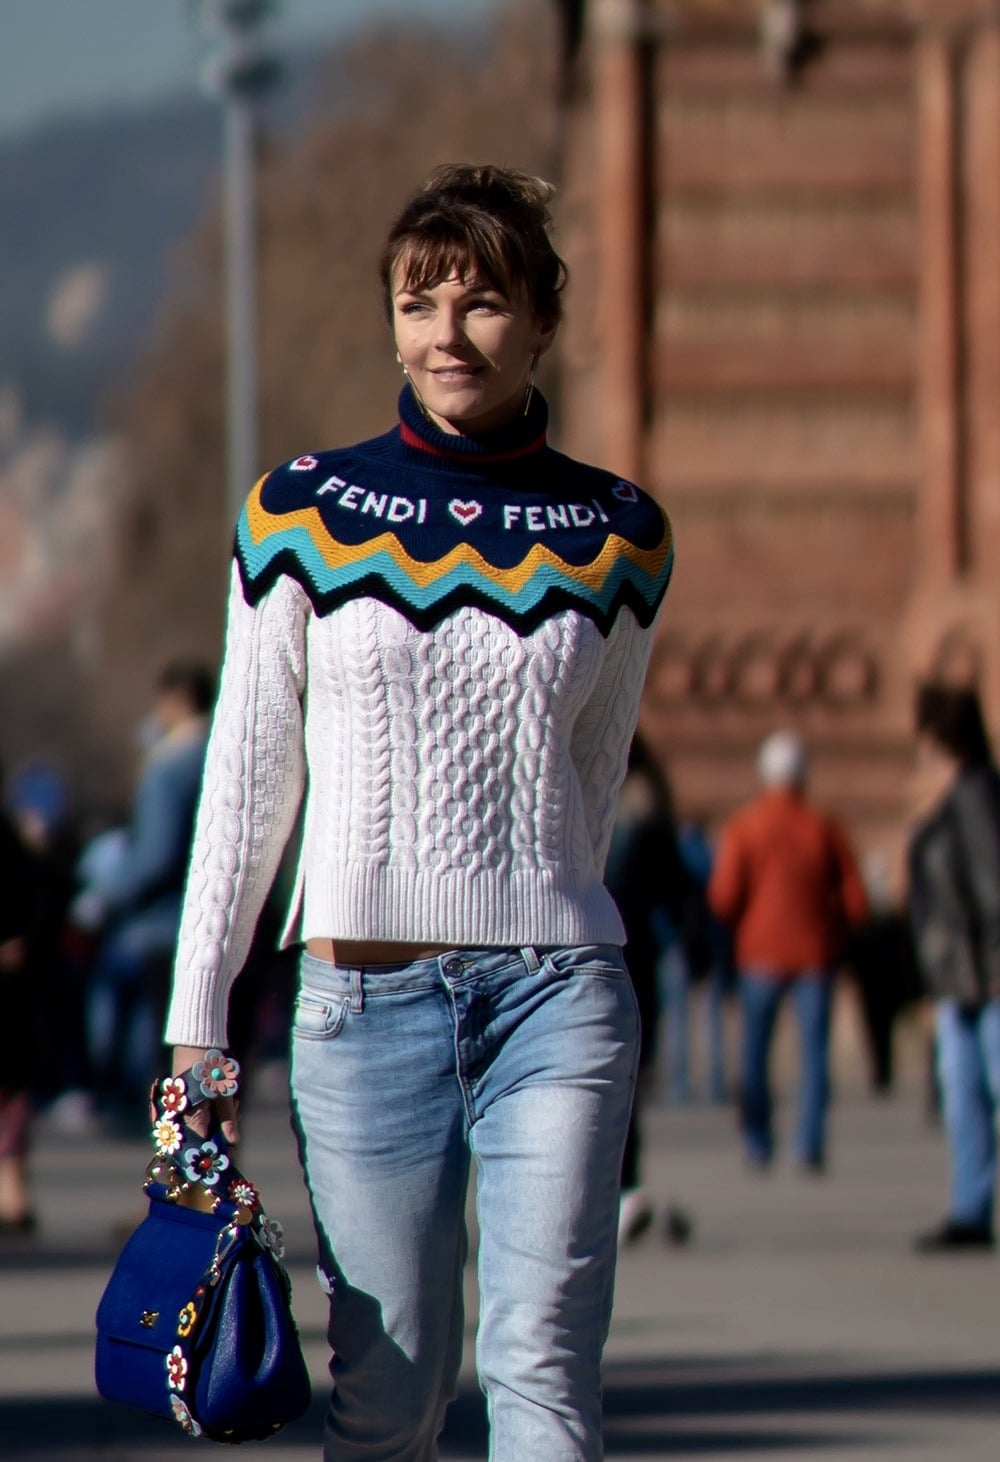 Walking in the street in Fendi jumper and denim